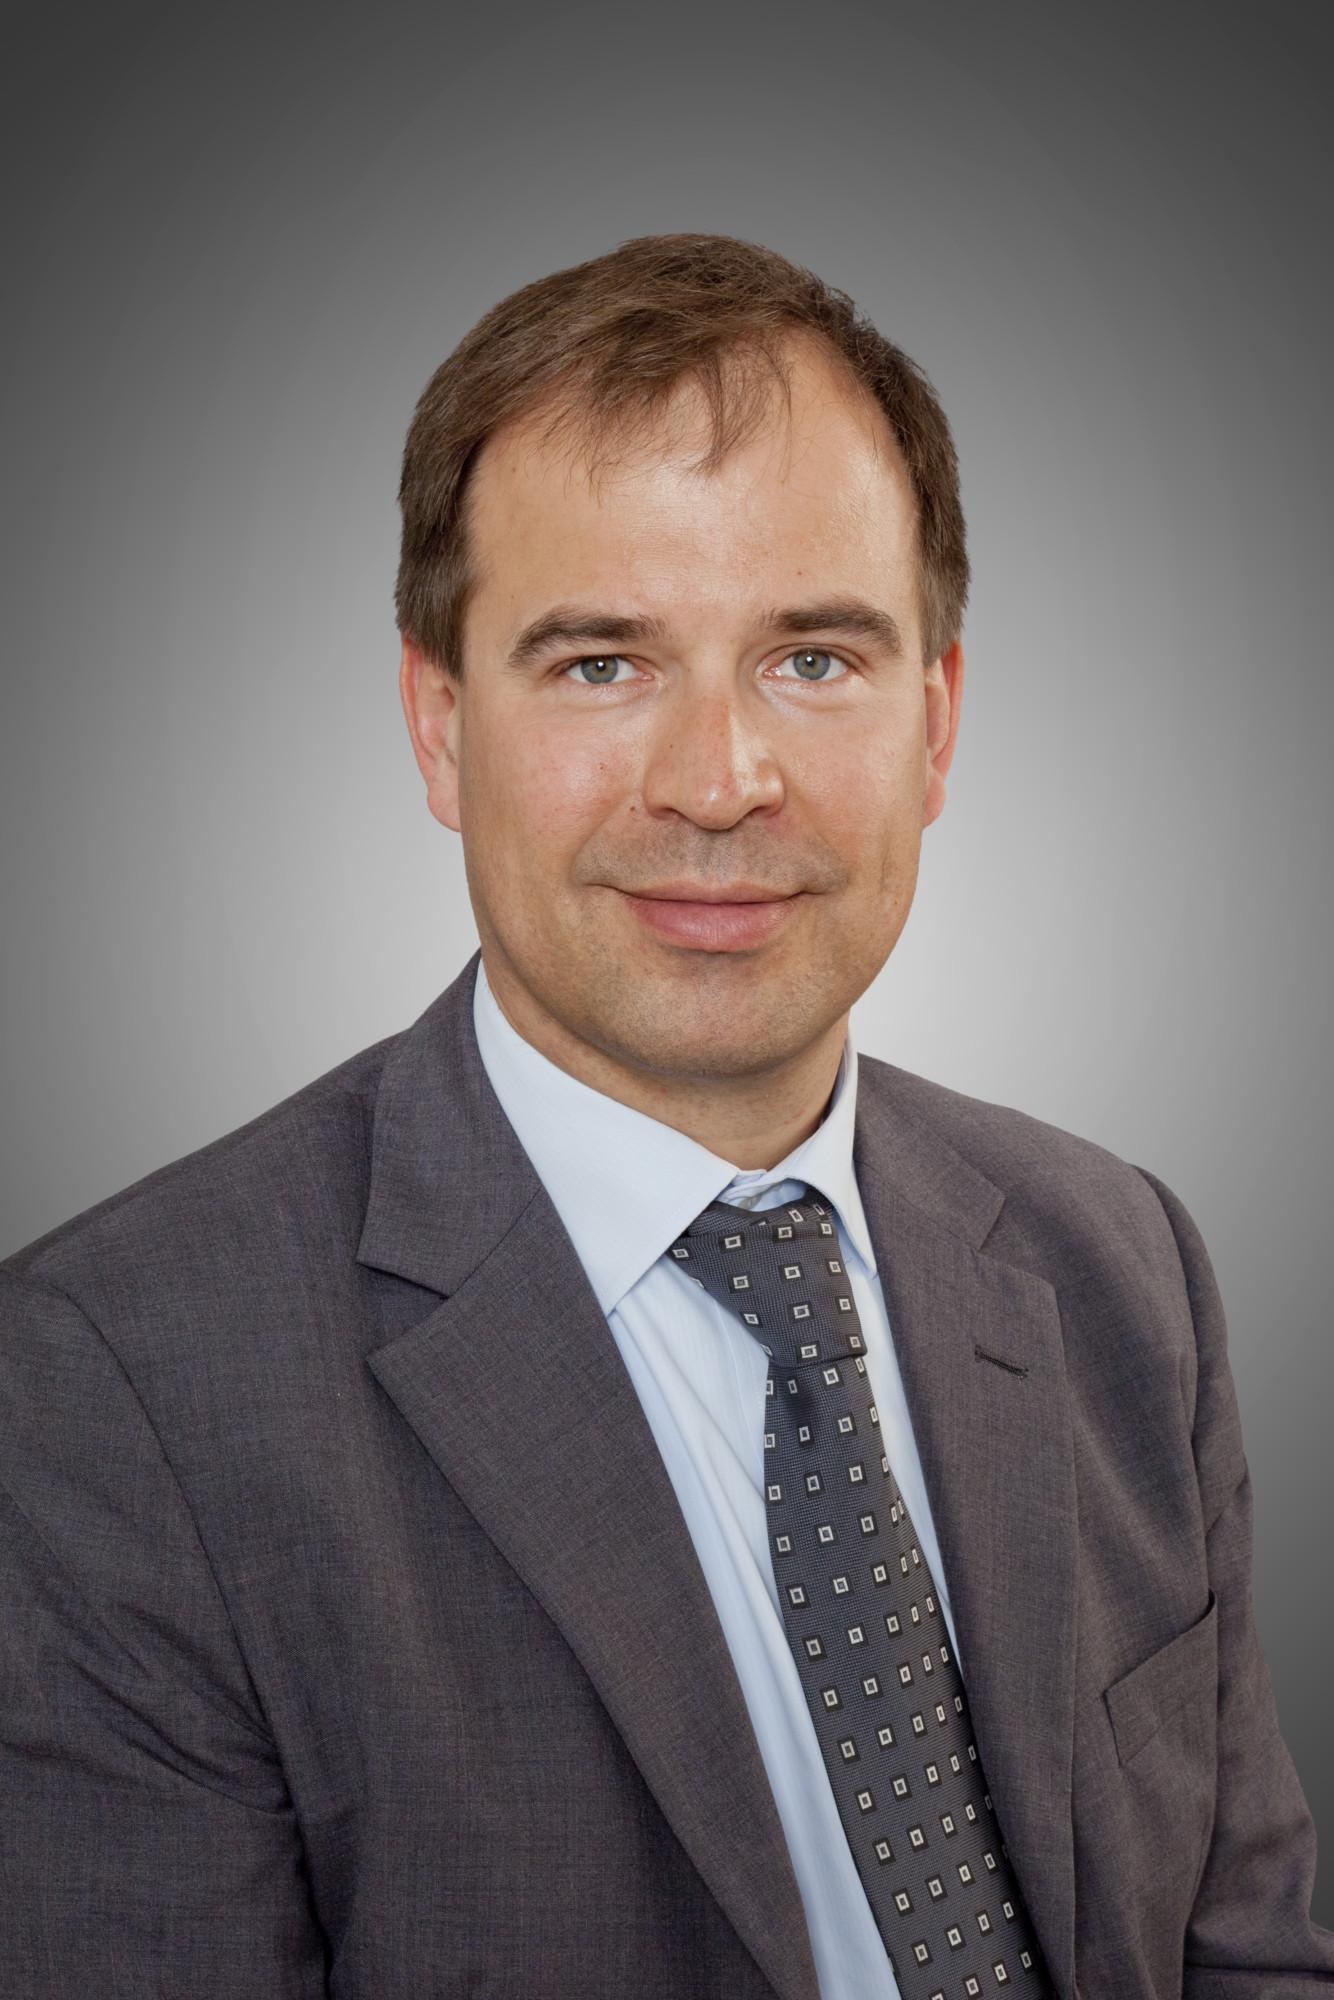 Prof. Dr.-Ing. Dietmar Drummer